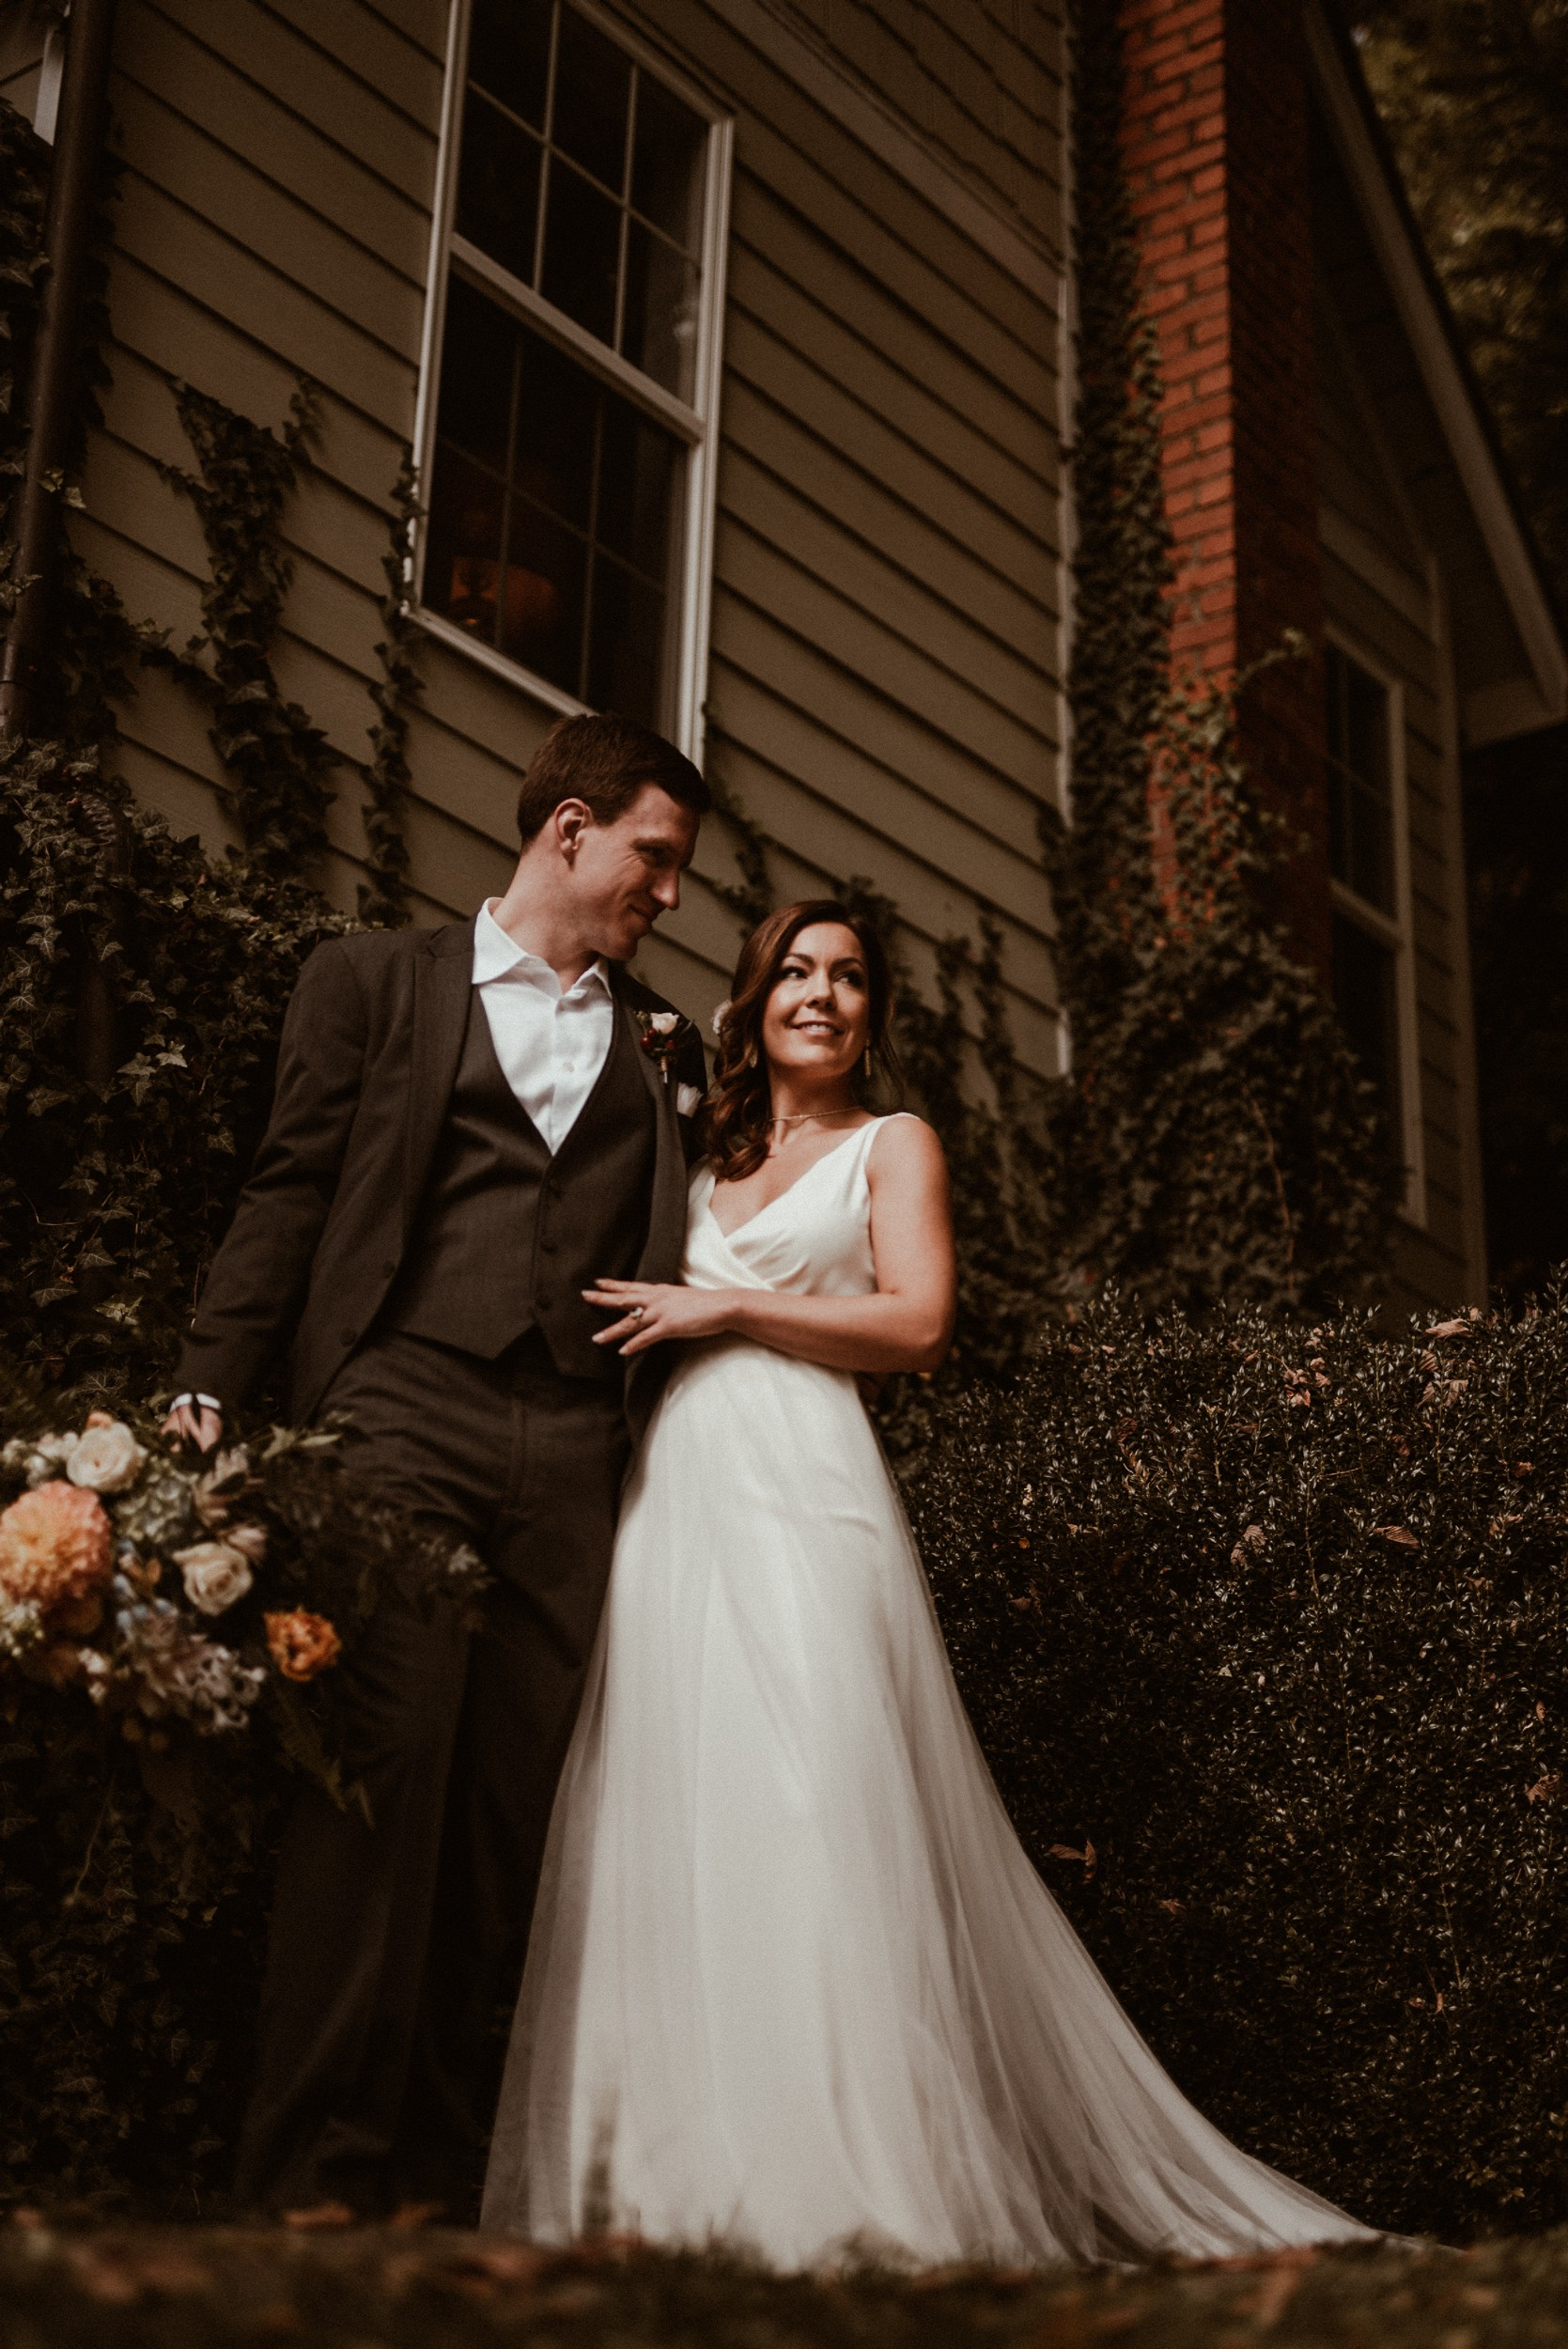 north-carolina-fall-vineyard-wedding-vanessaalvesphotography-41.jpg